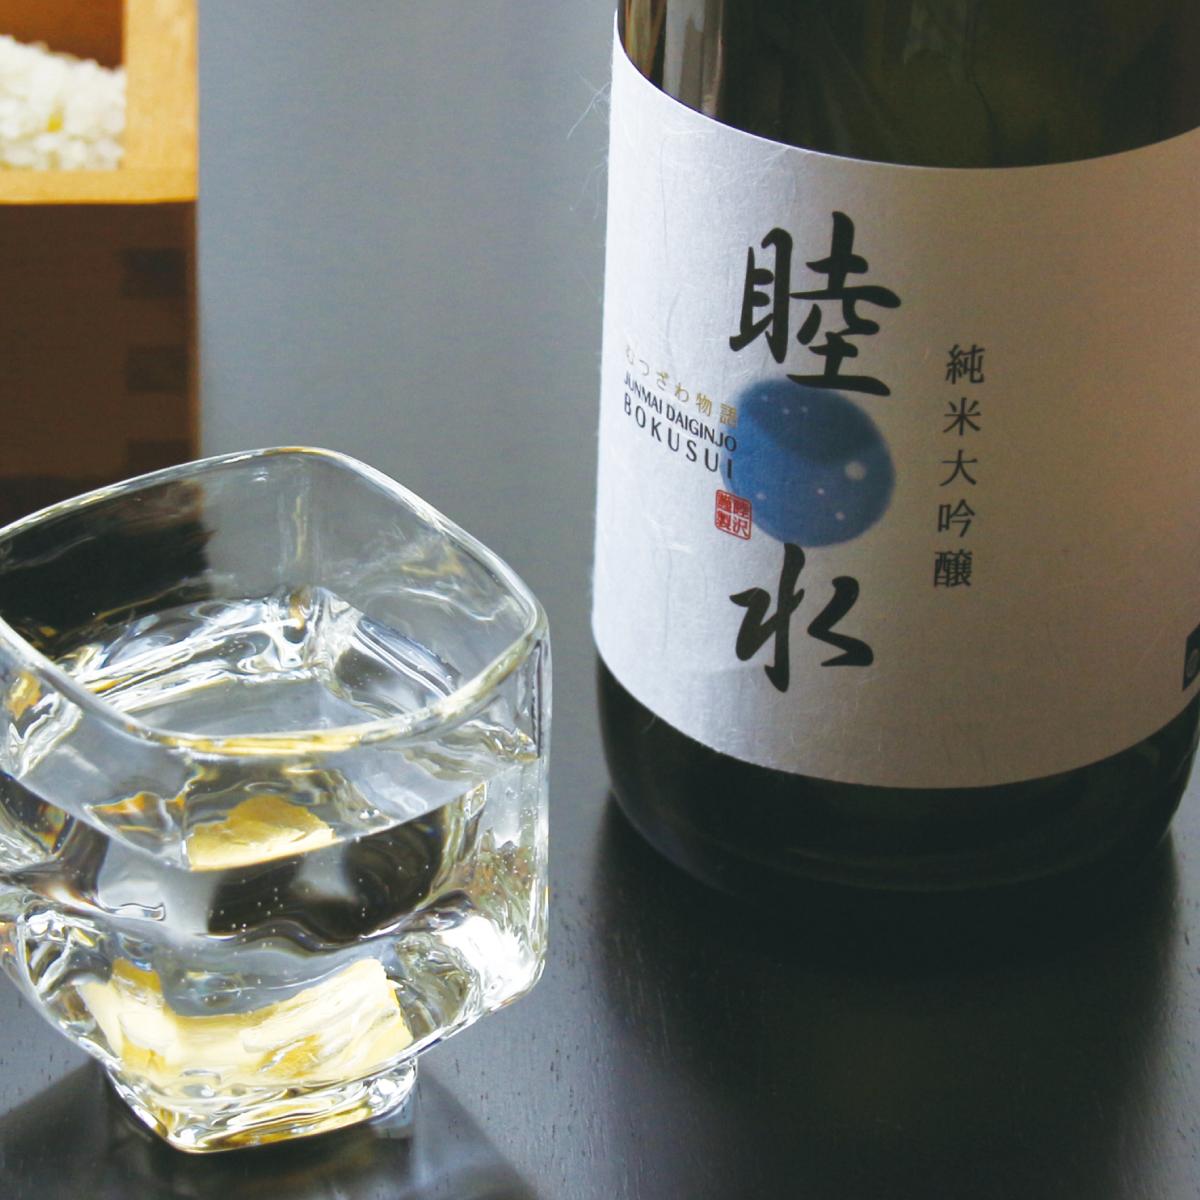 千葉県睦沢町の特産品 Mutsuzawa,chiba